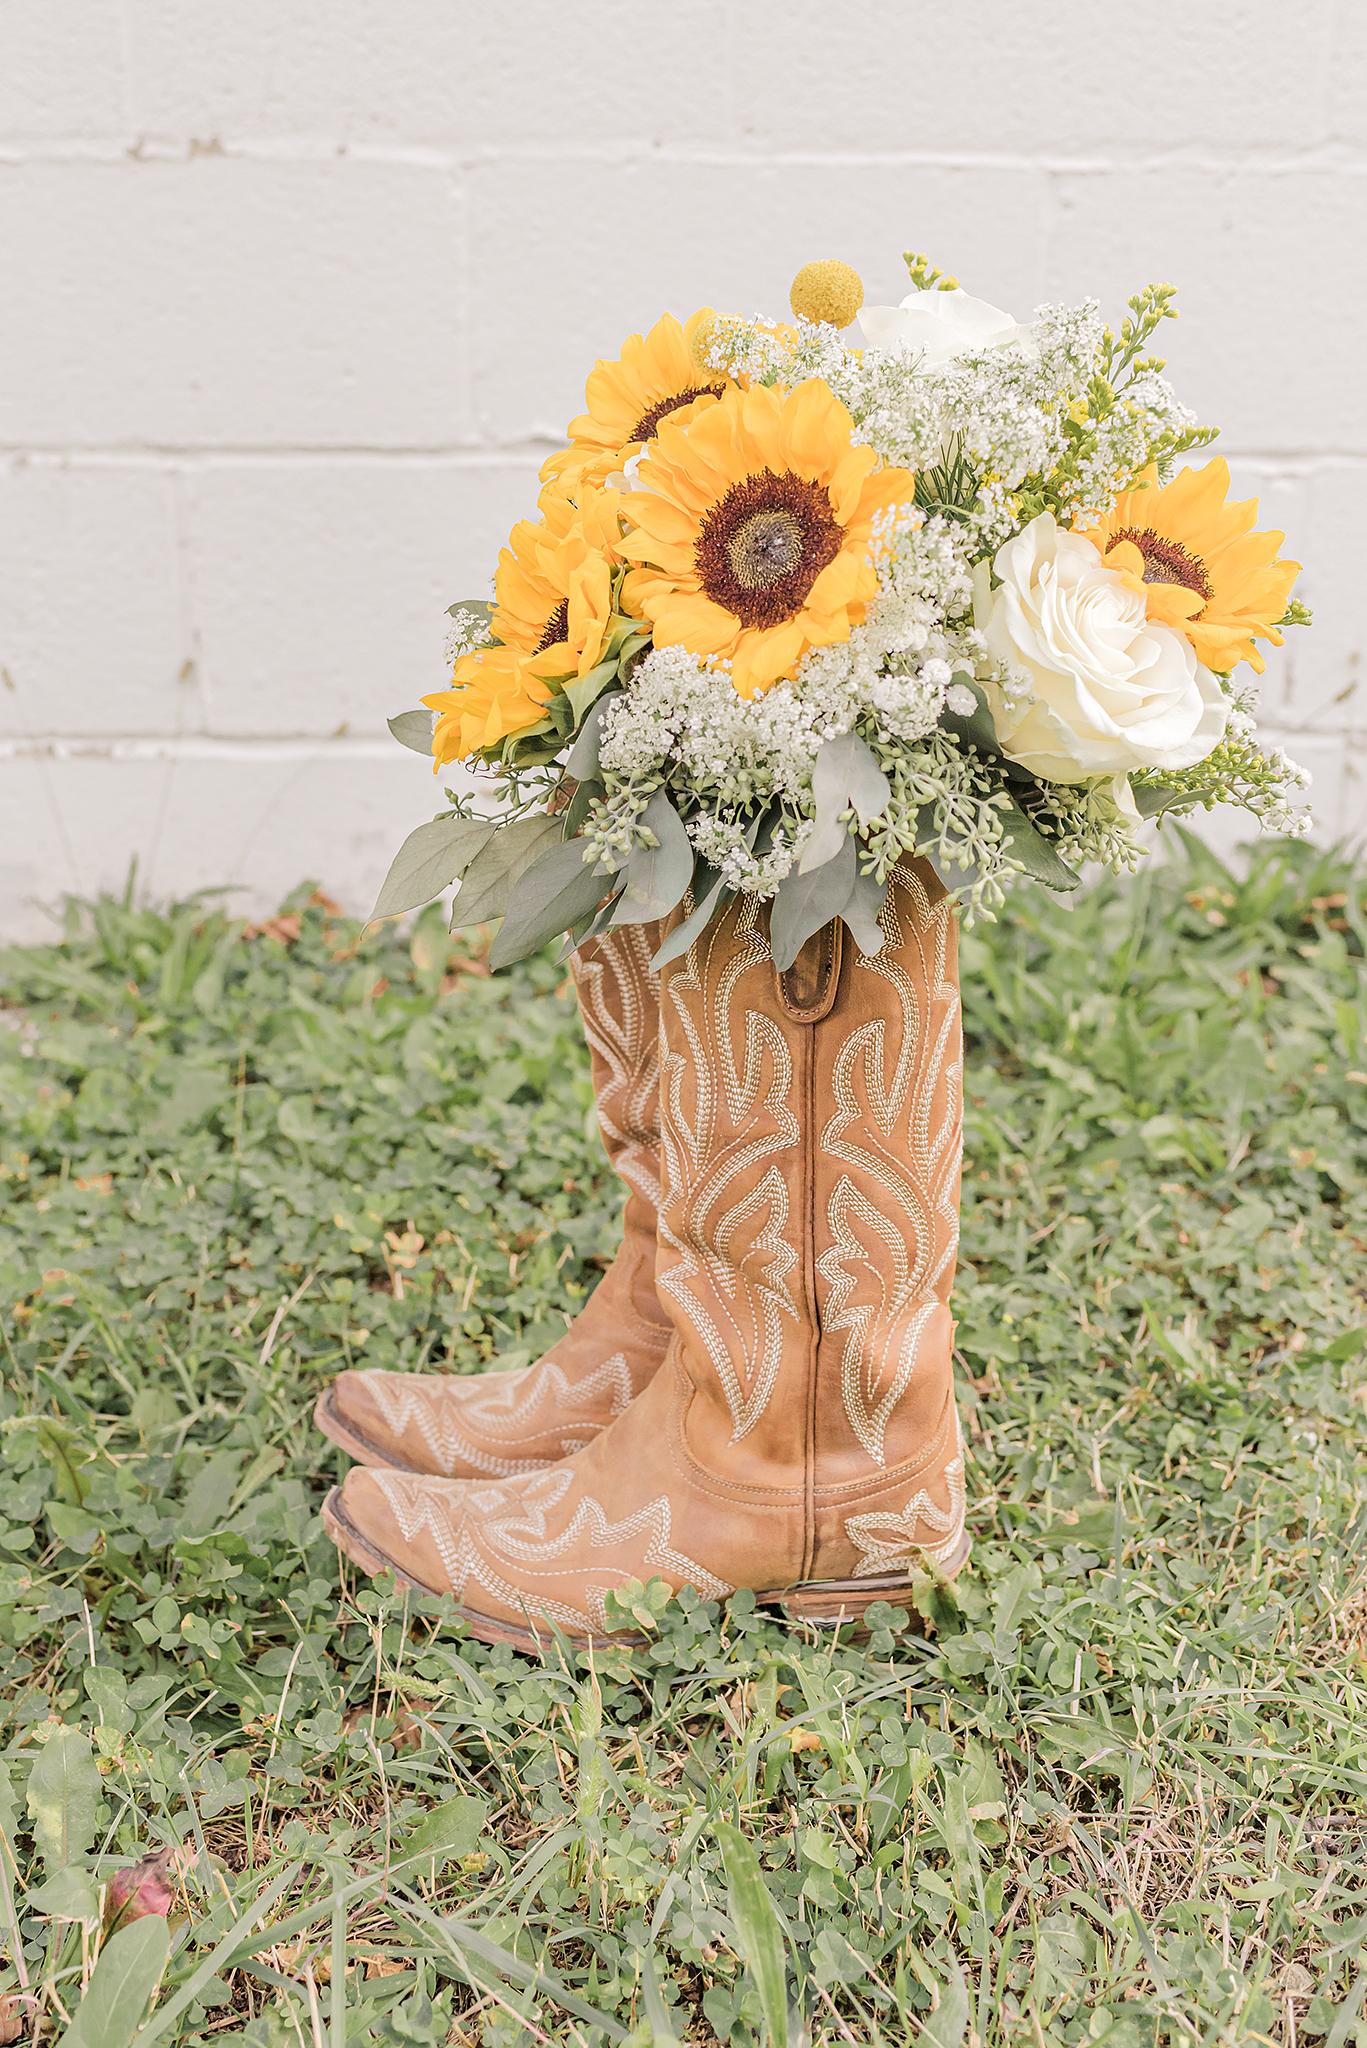 Lindsay-Adkins-Photography-Michigan-Wedding-Photographer-Wind-Hill-Farm-3